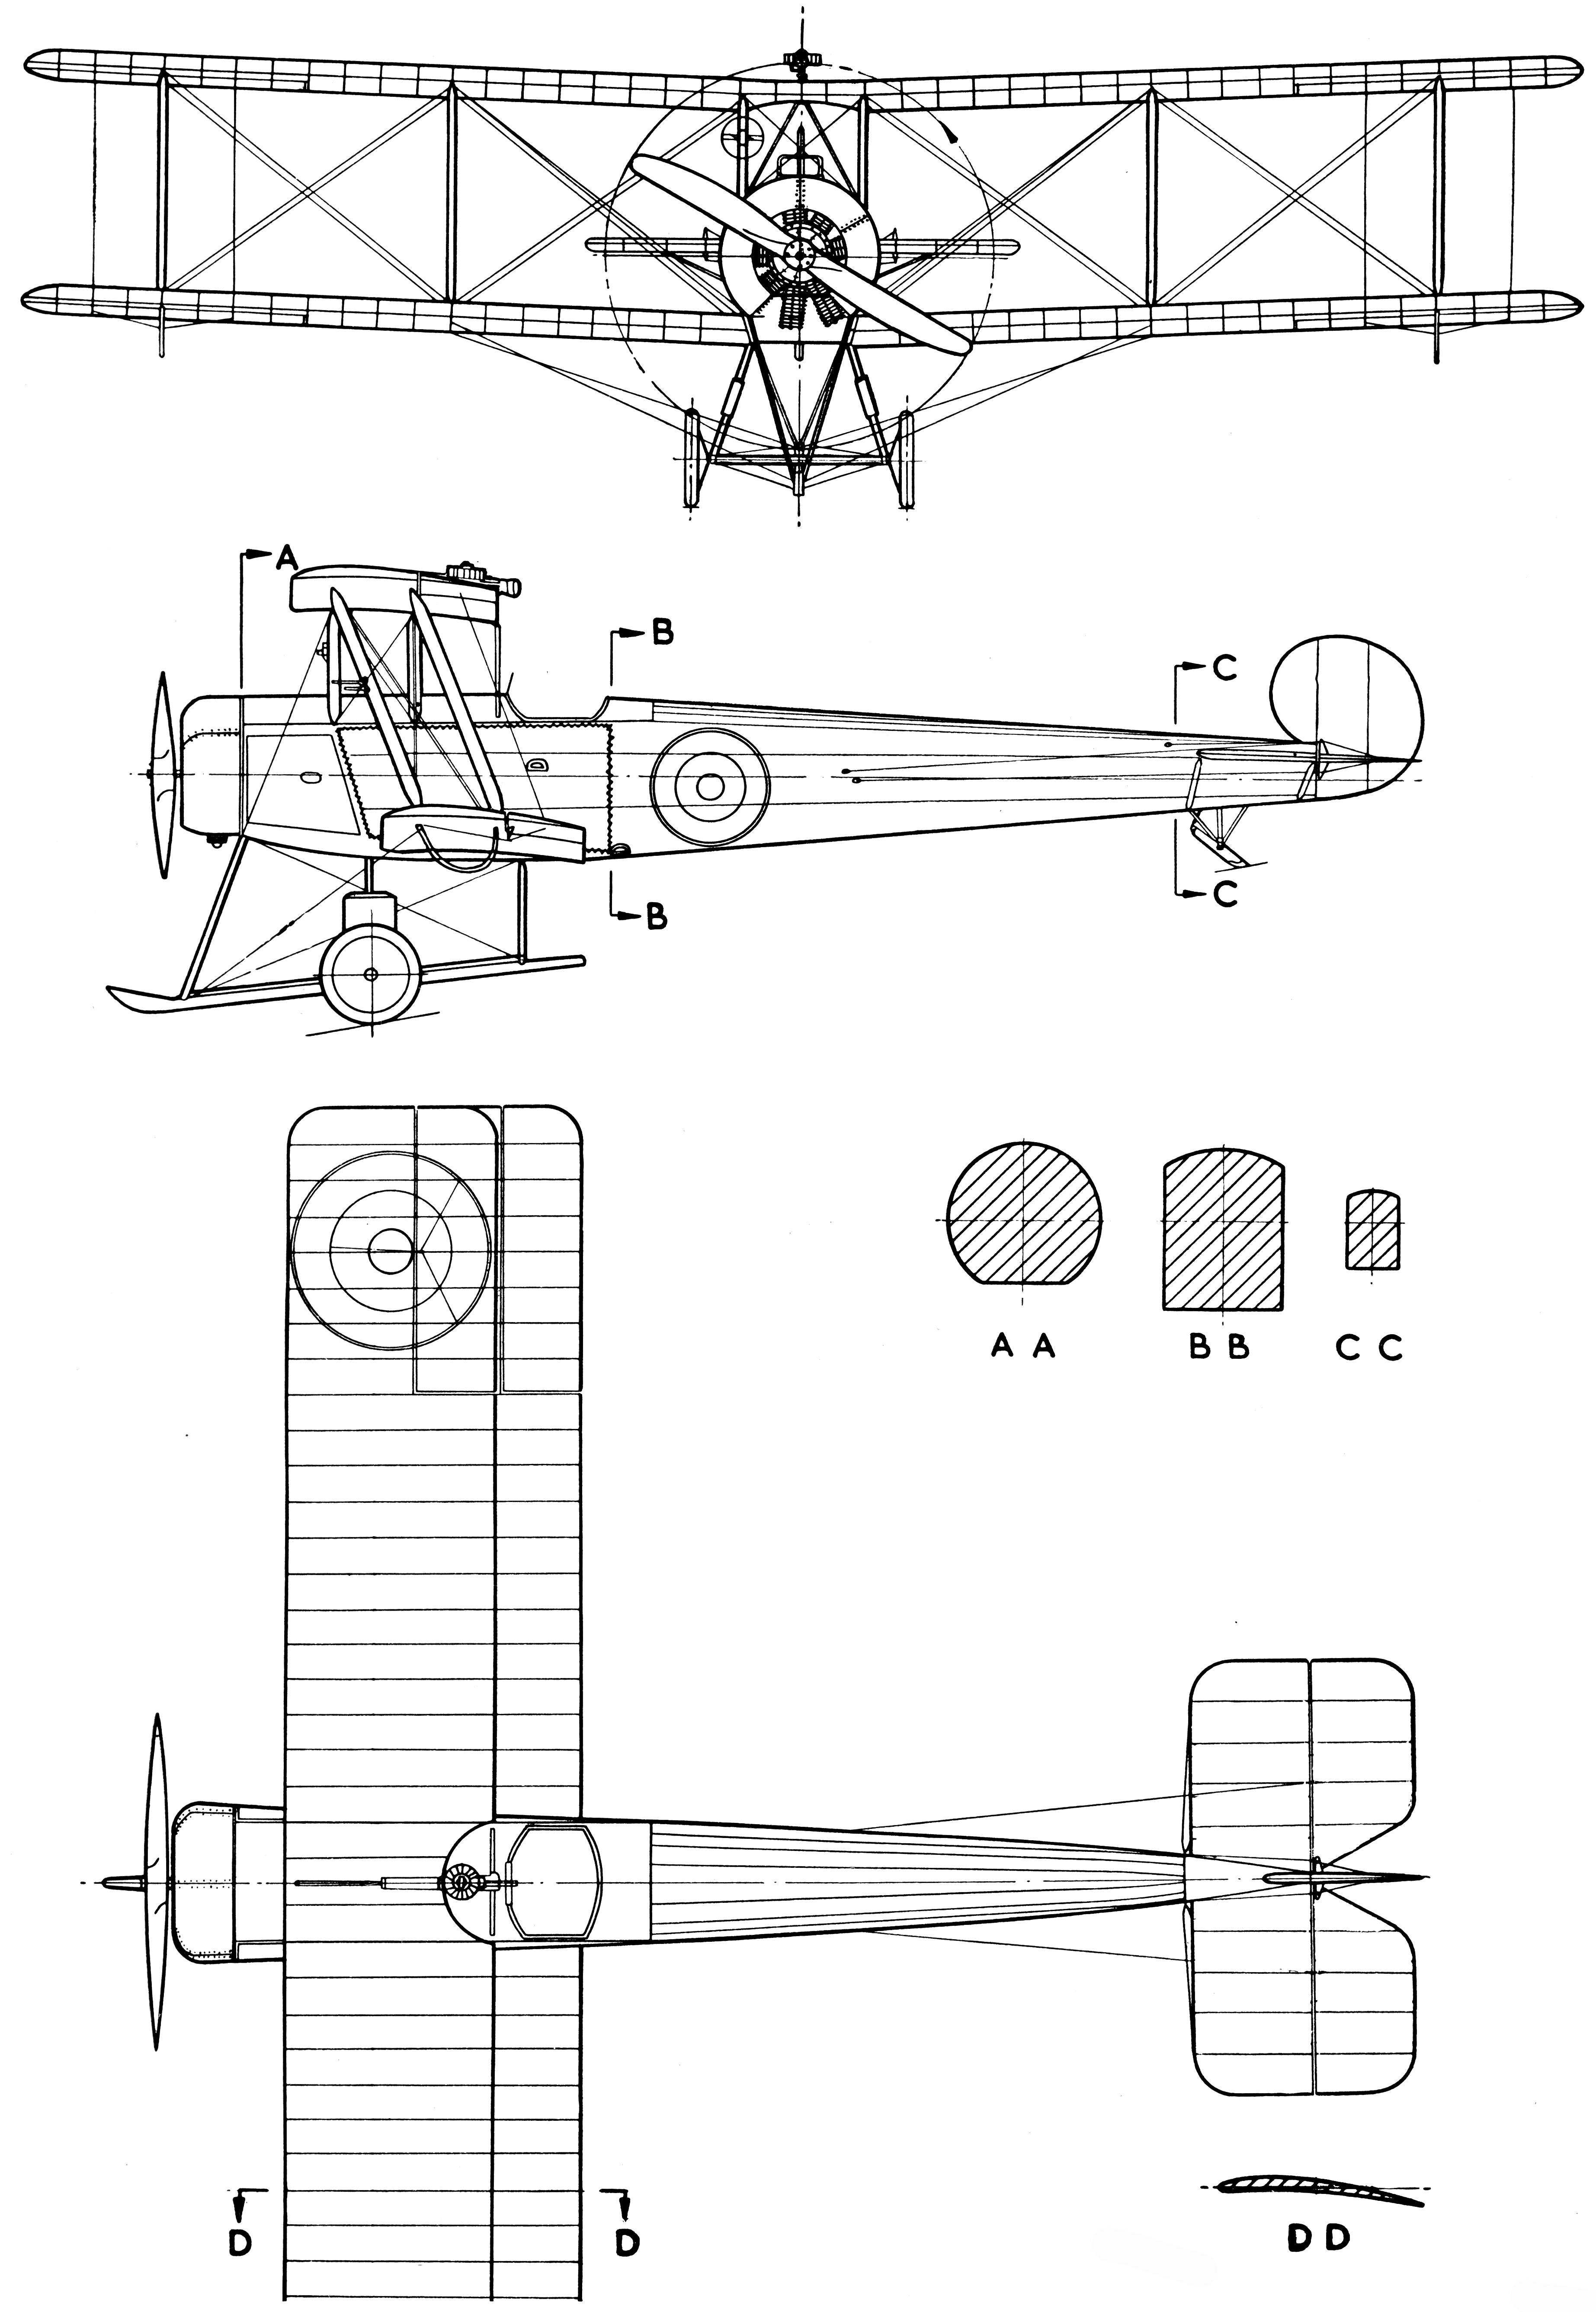 Avro 504k blueprint blueprints pinterest avro 504k blueprint malvernweather Gallery